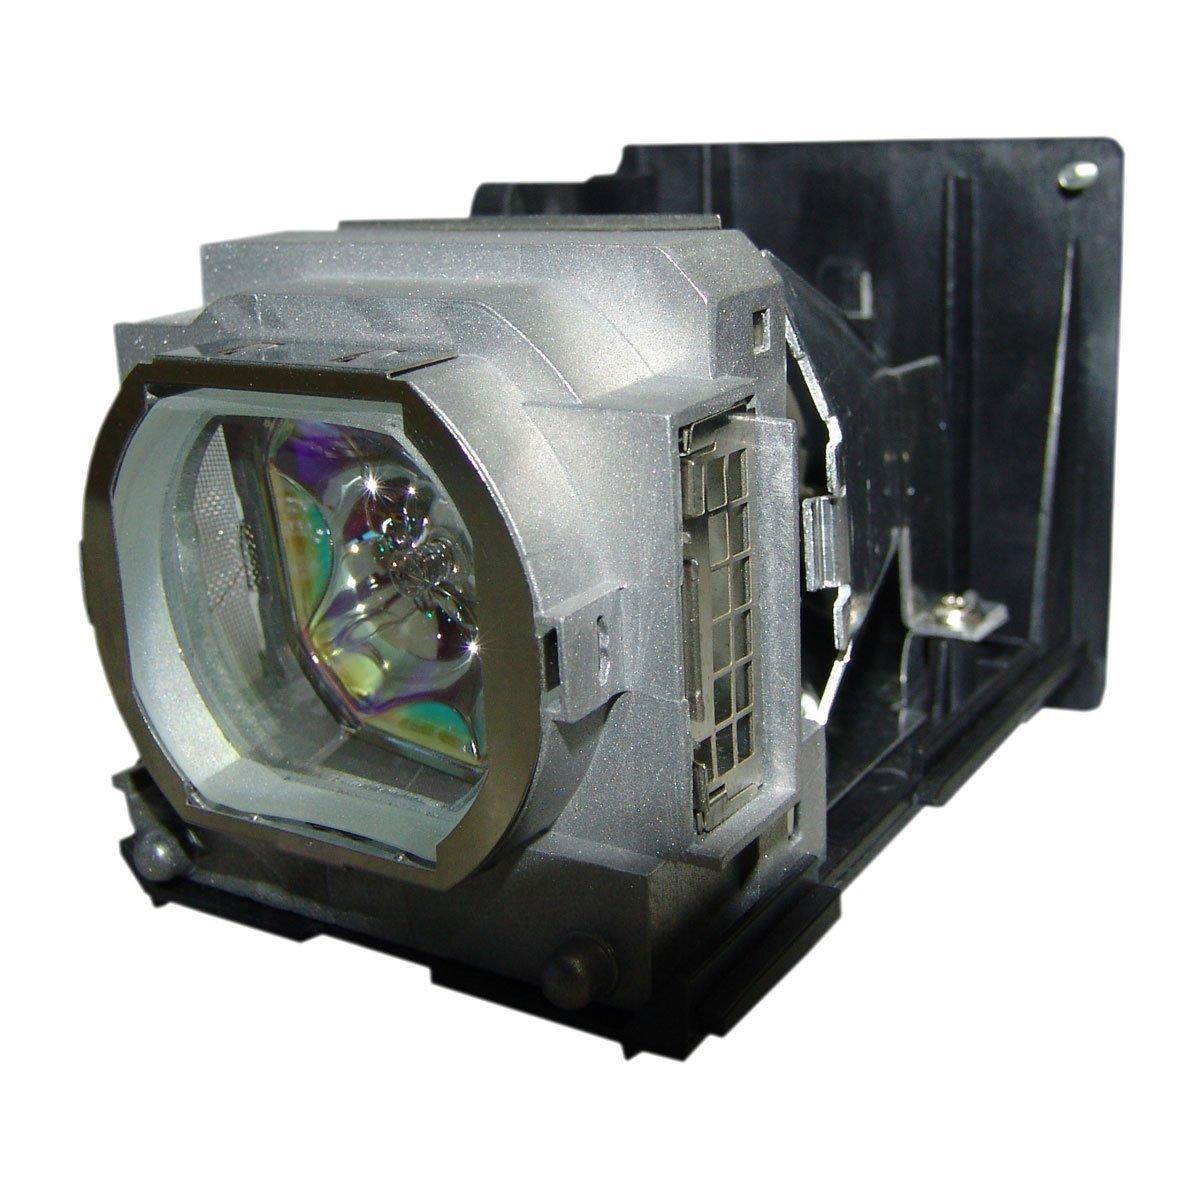 Projector Lamp Bulb VLT-HC7000LP VLTHC7000LP HC7000LP for Mitsubishi HC6500 HC7000 HC6500U HC7000U with housing free shipping new bulb vlt hc7000lp lamp with housing for mitsubishi hc6500 hc7000 180day warranty